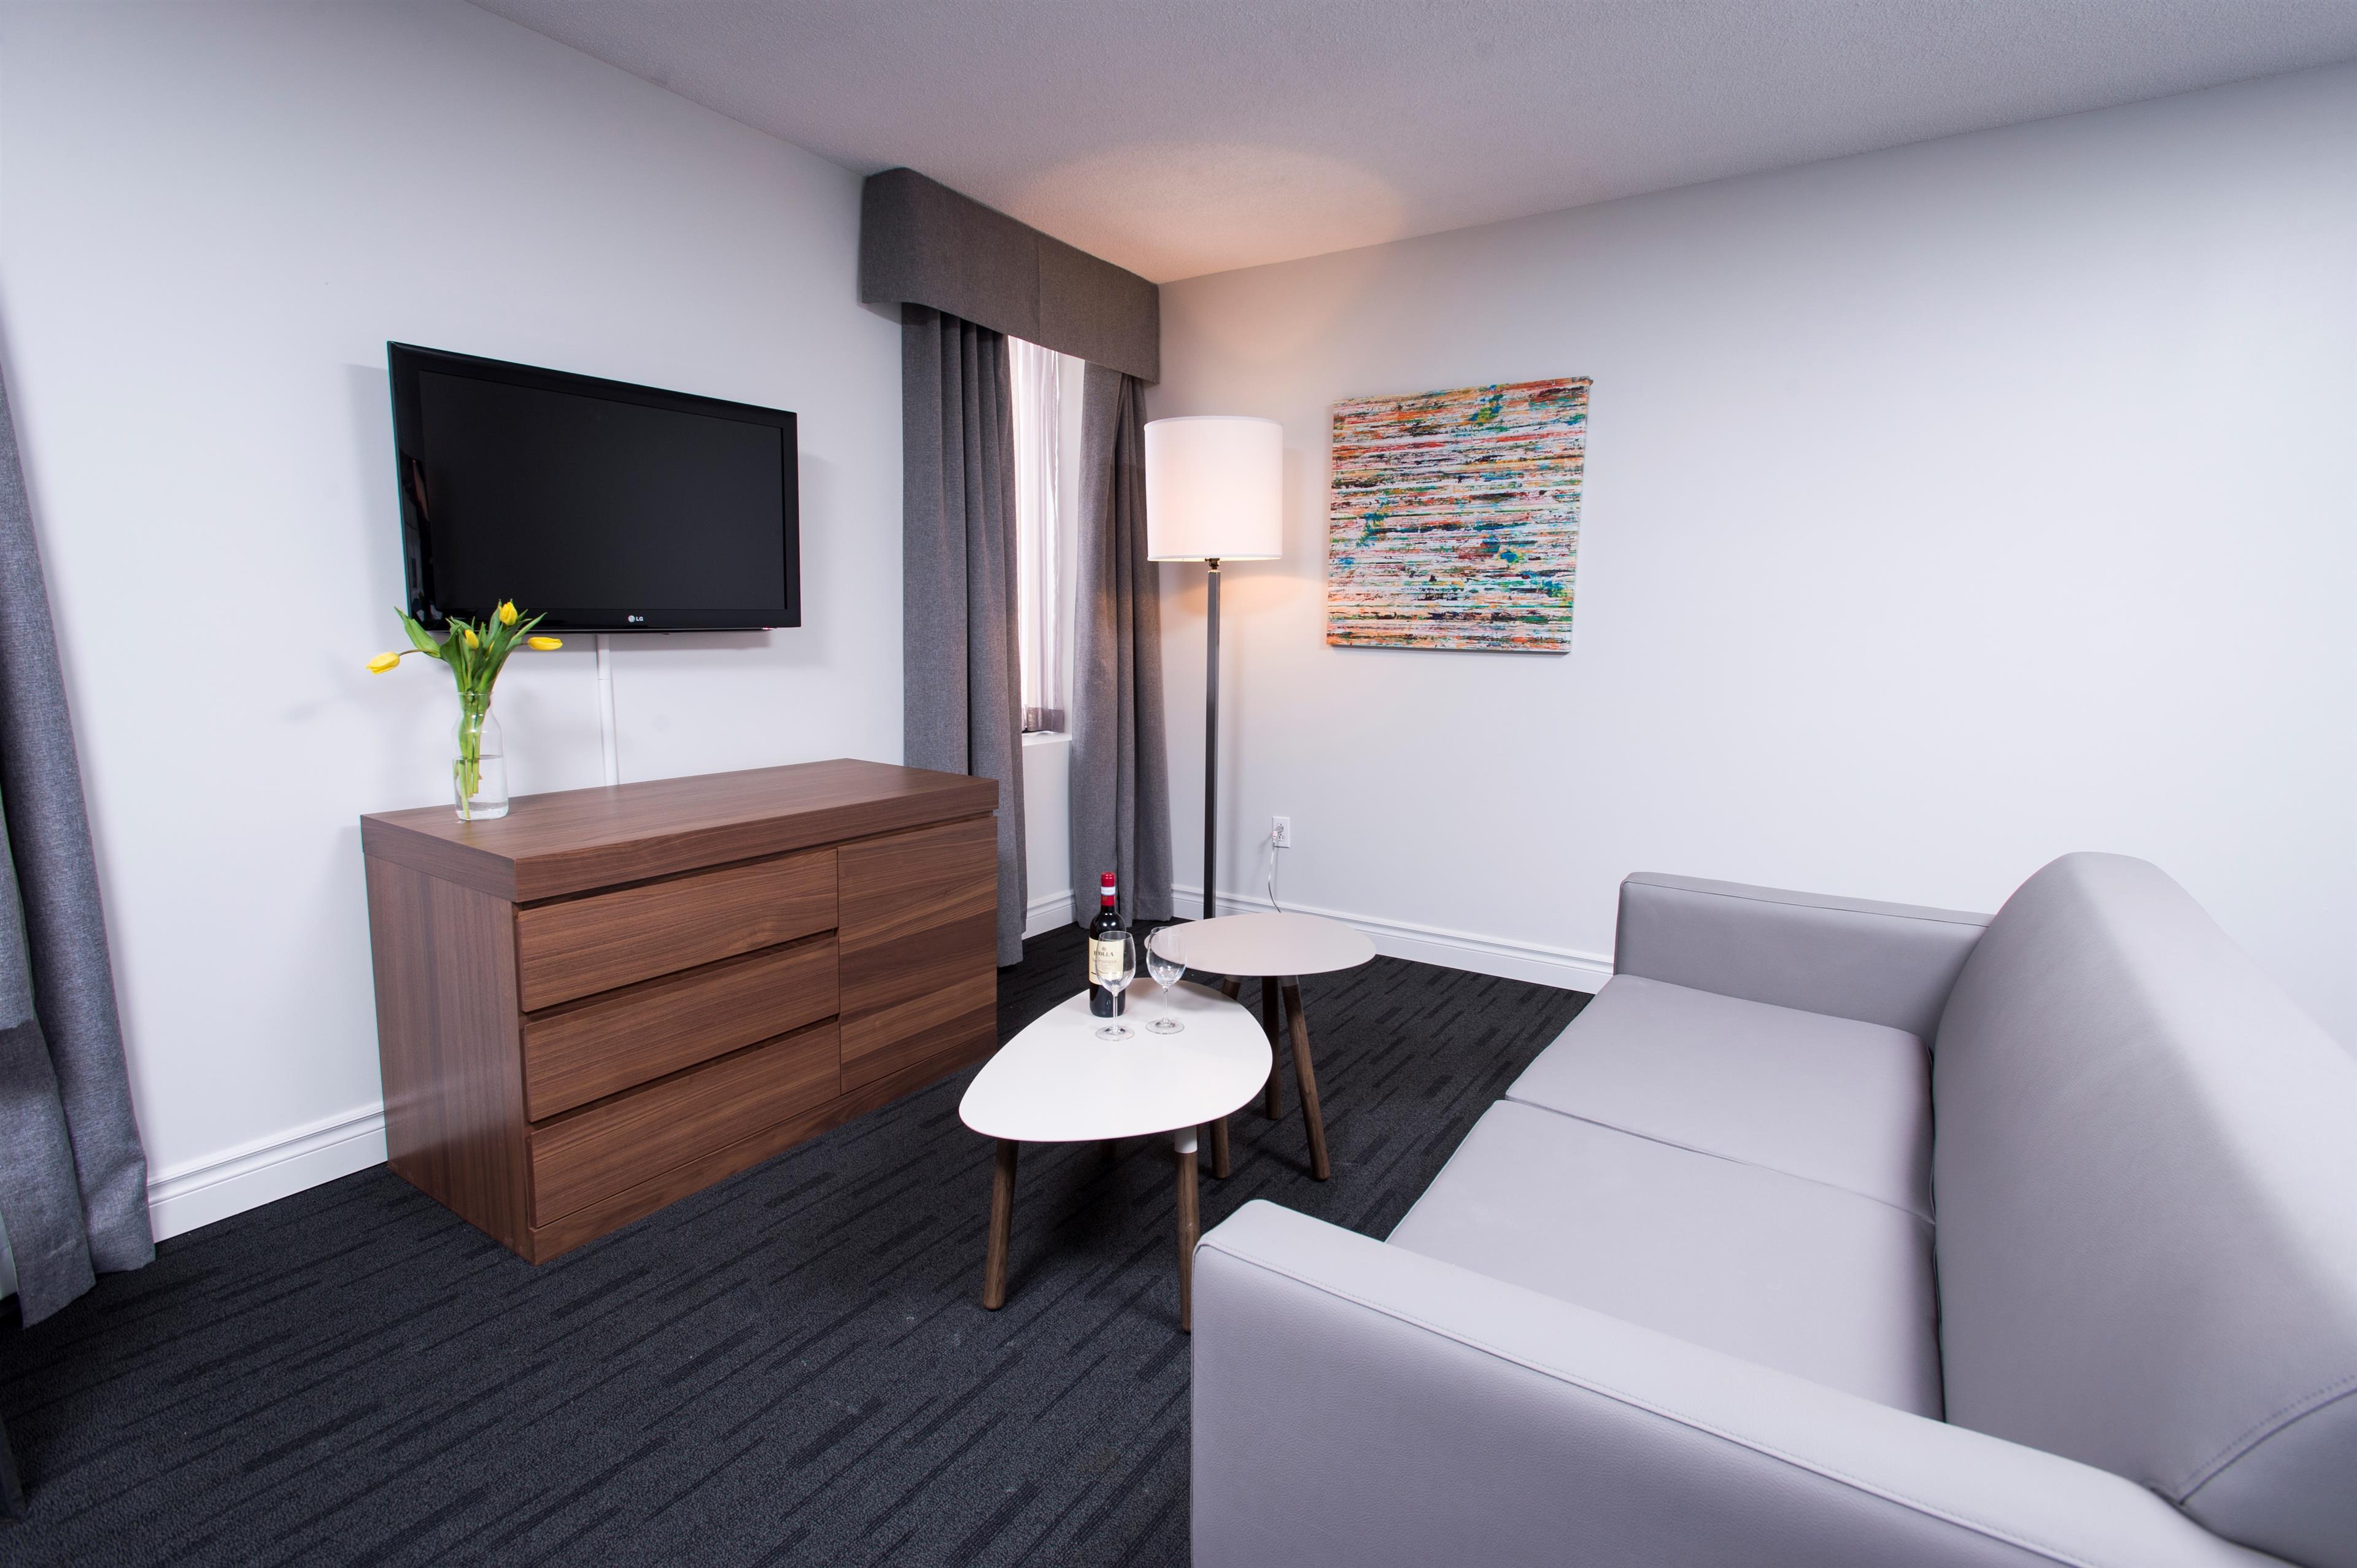 Best Western Plus Hotel Albert Rouyn-Noranda à Rouyn-Noranda: King Suite Living Area